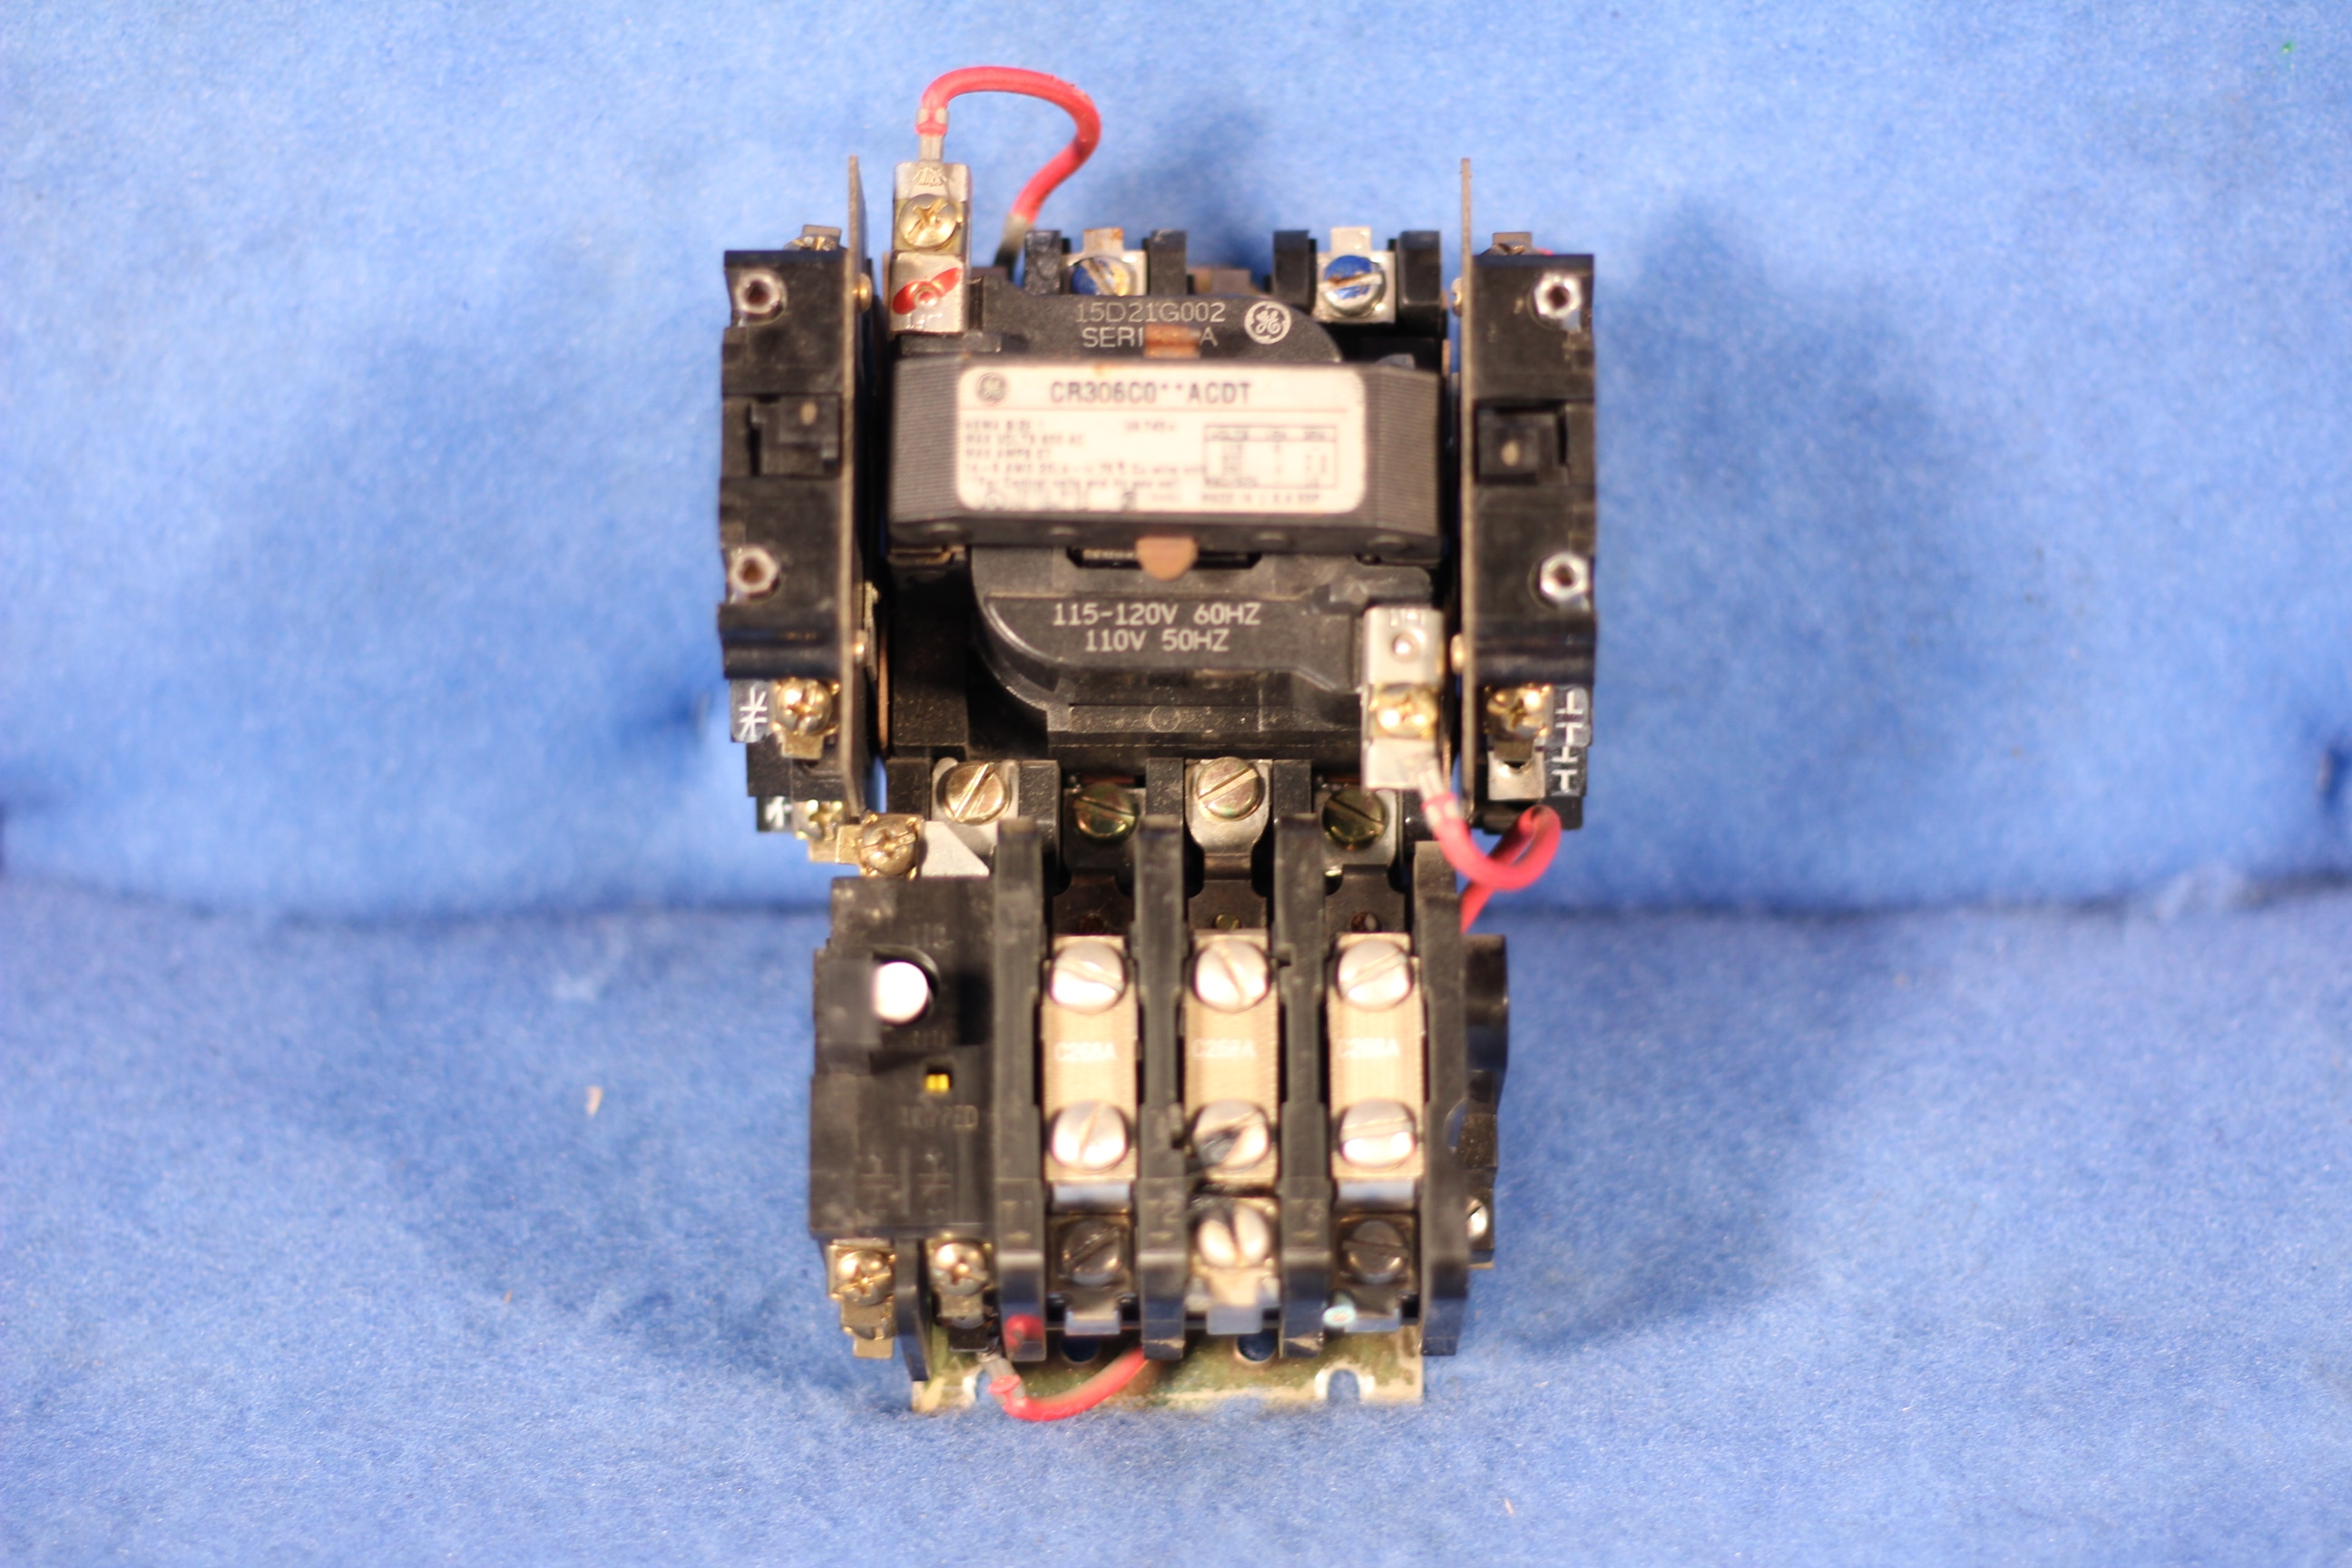 GE CR306 CO**ACDT Nema Size 1 Motor Starter 600 MAX V 27 MAX A 1 Year  Warranty | eBay eBay